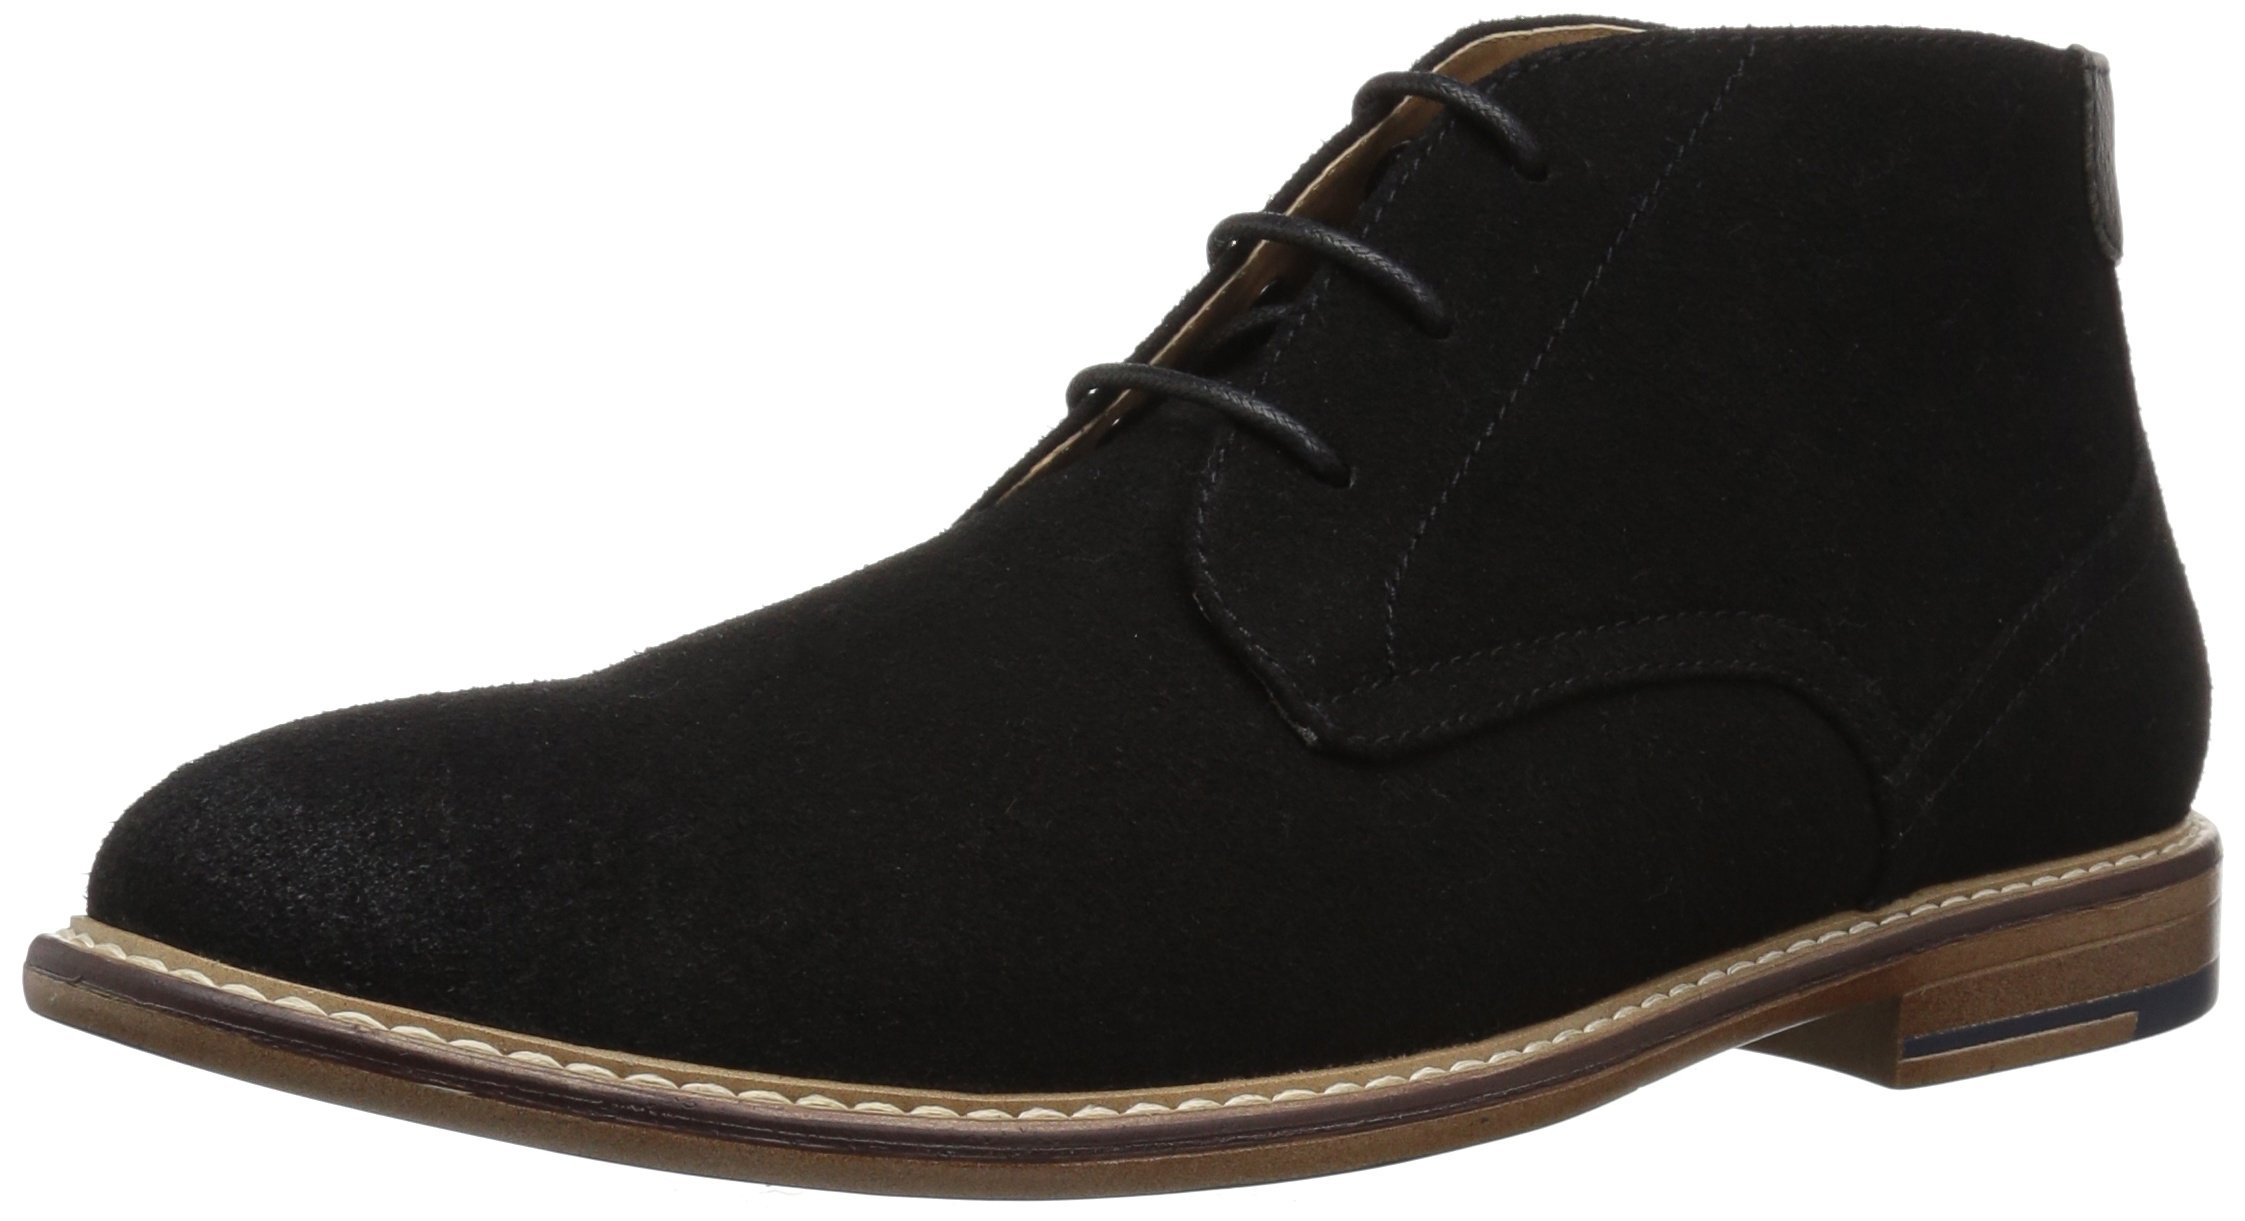 Madden Men's M-Gamma Chukka Boot, Black Suede, 9 M US